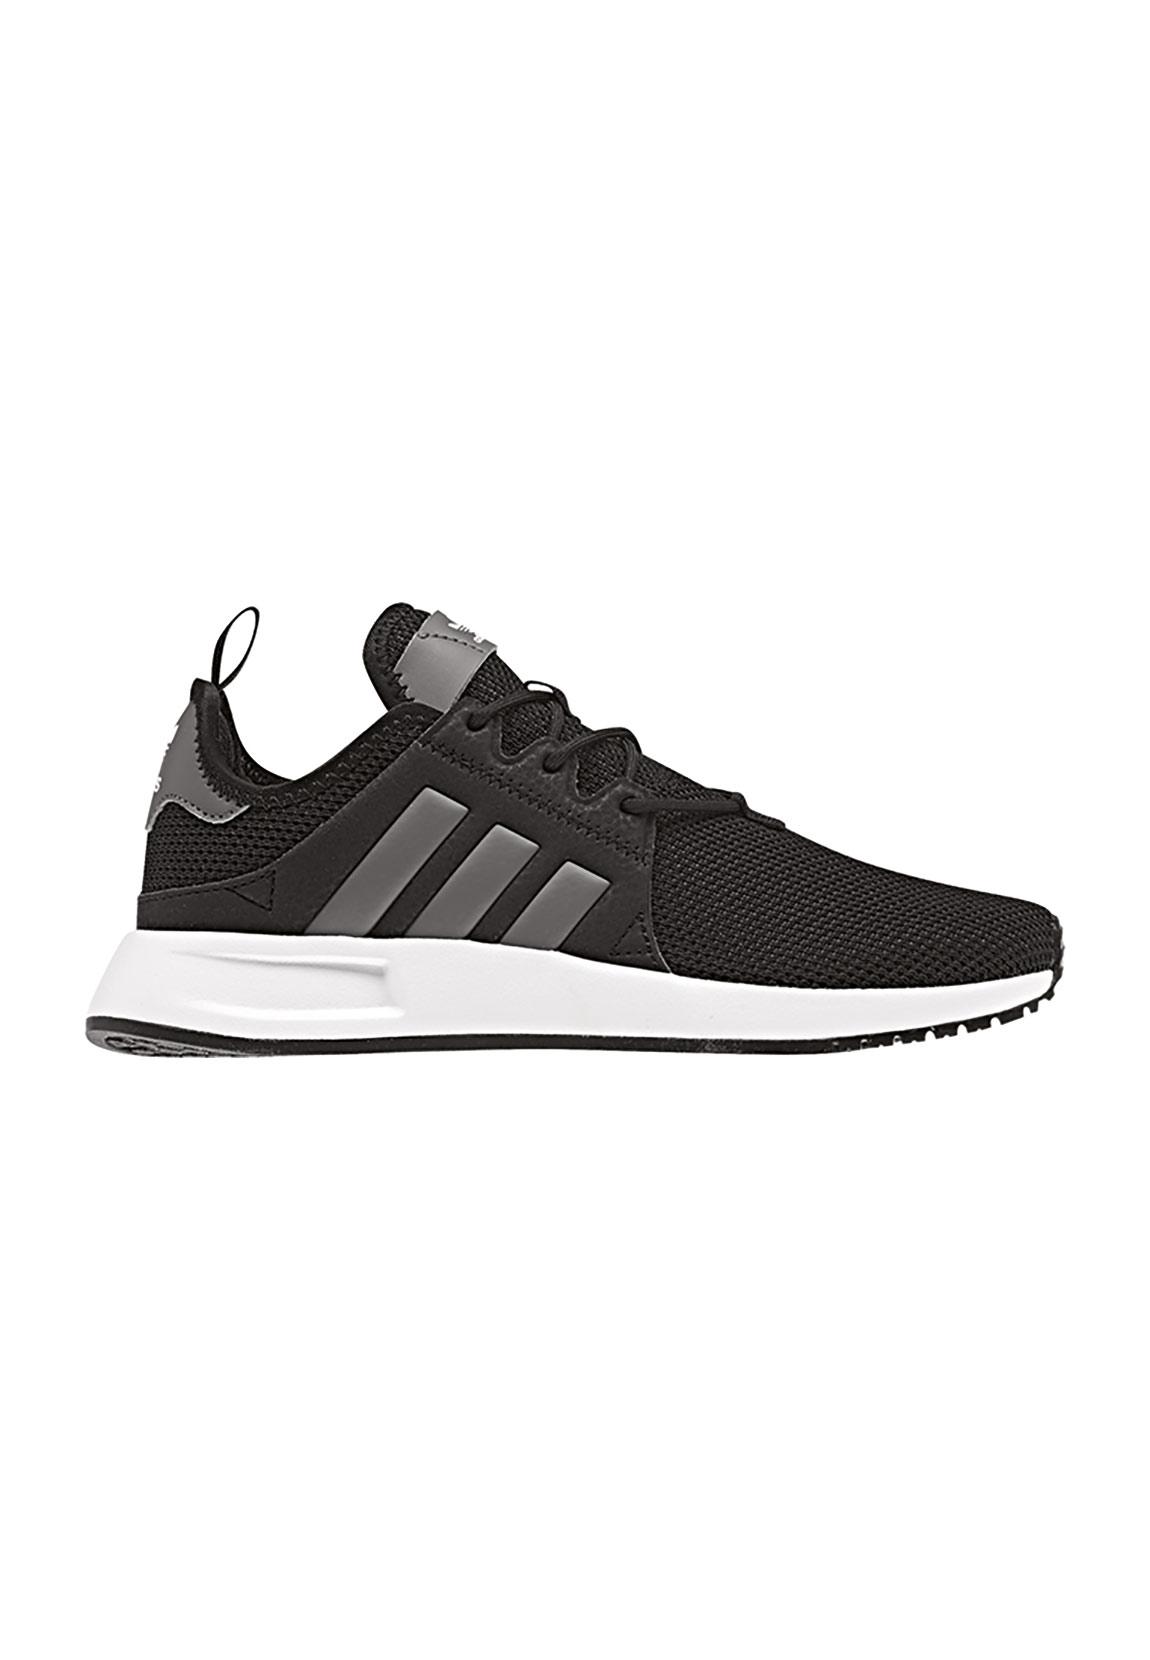 Adidas Originals Sneaker X_PLR CG6825 Schwarz Weiss